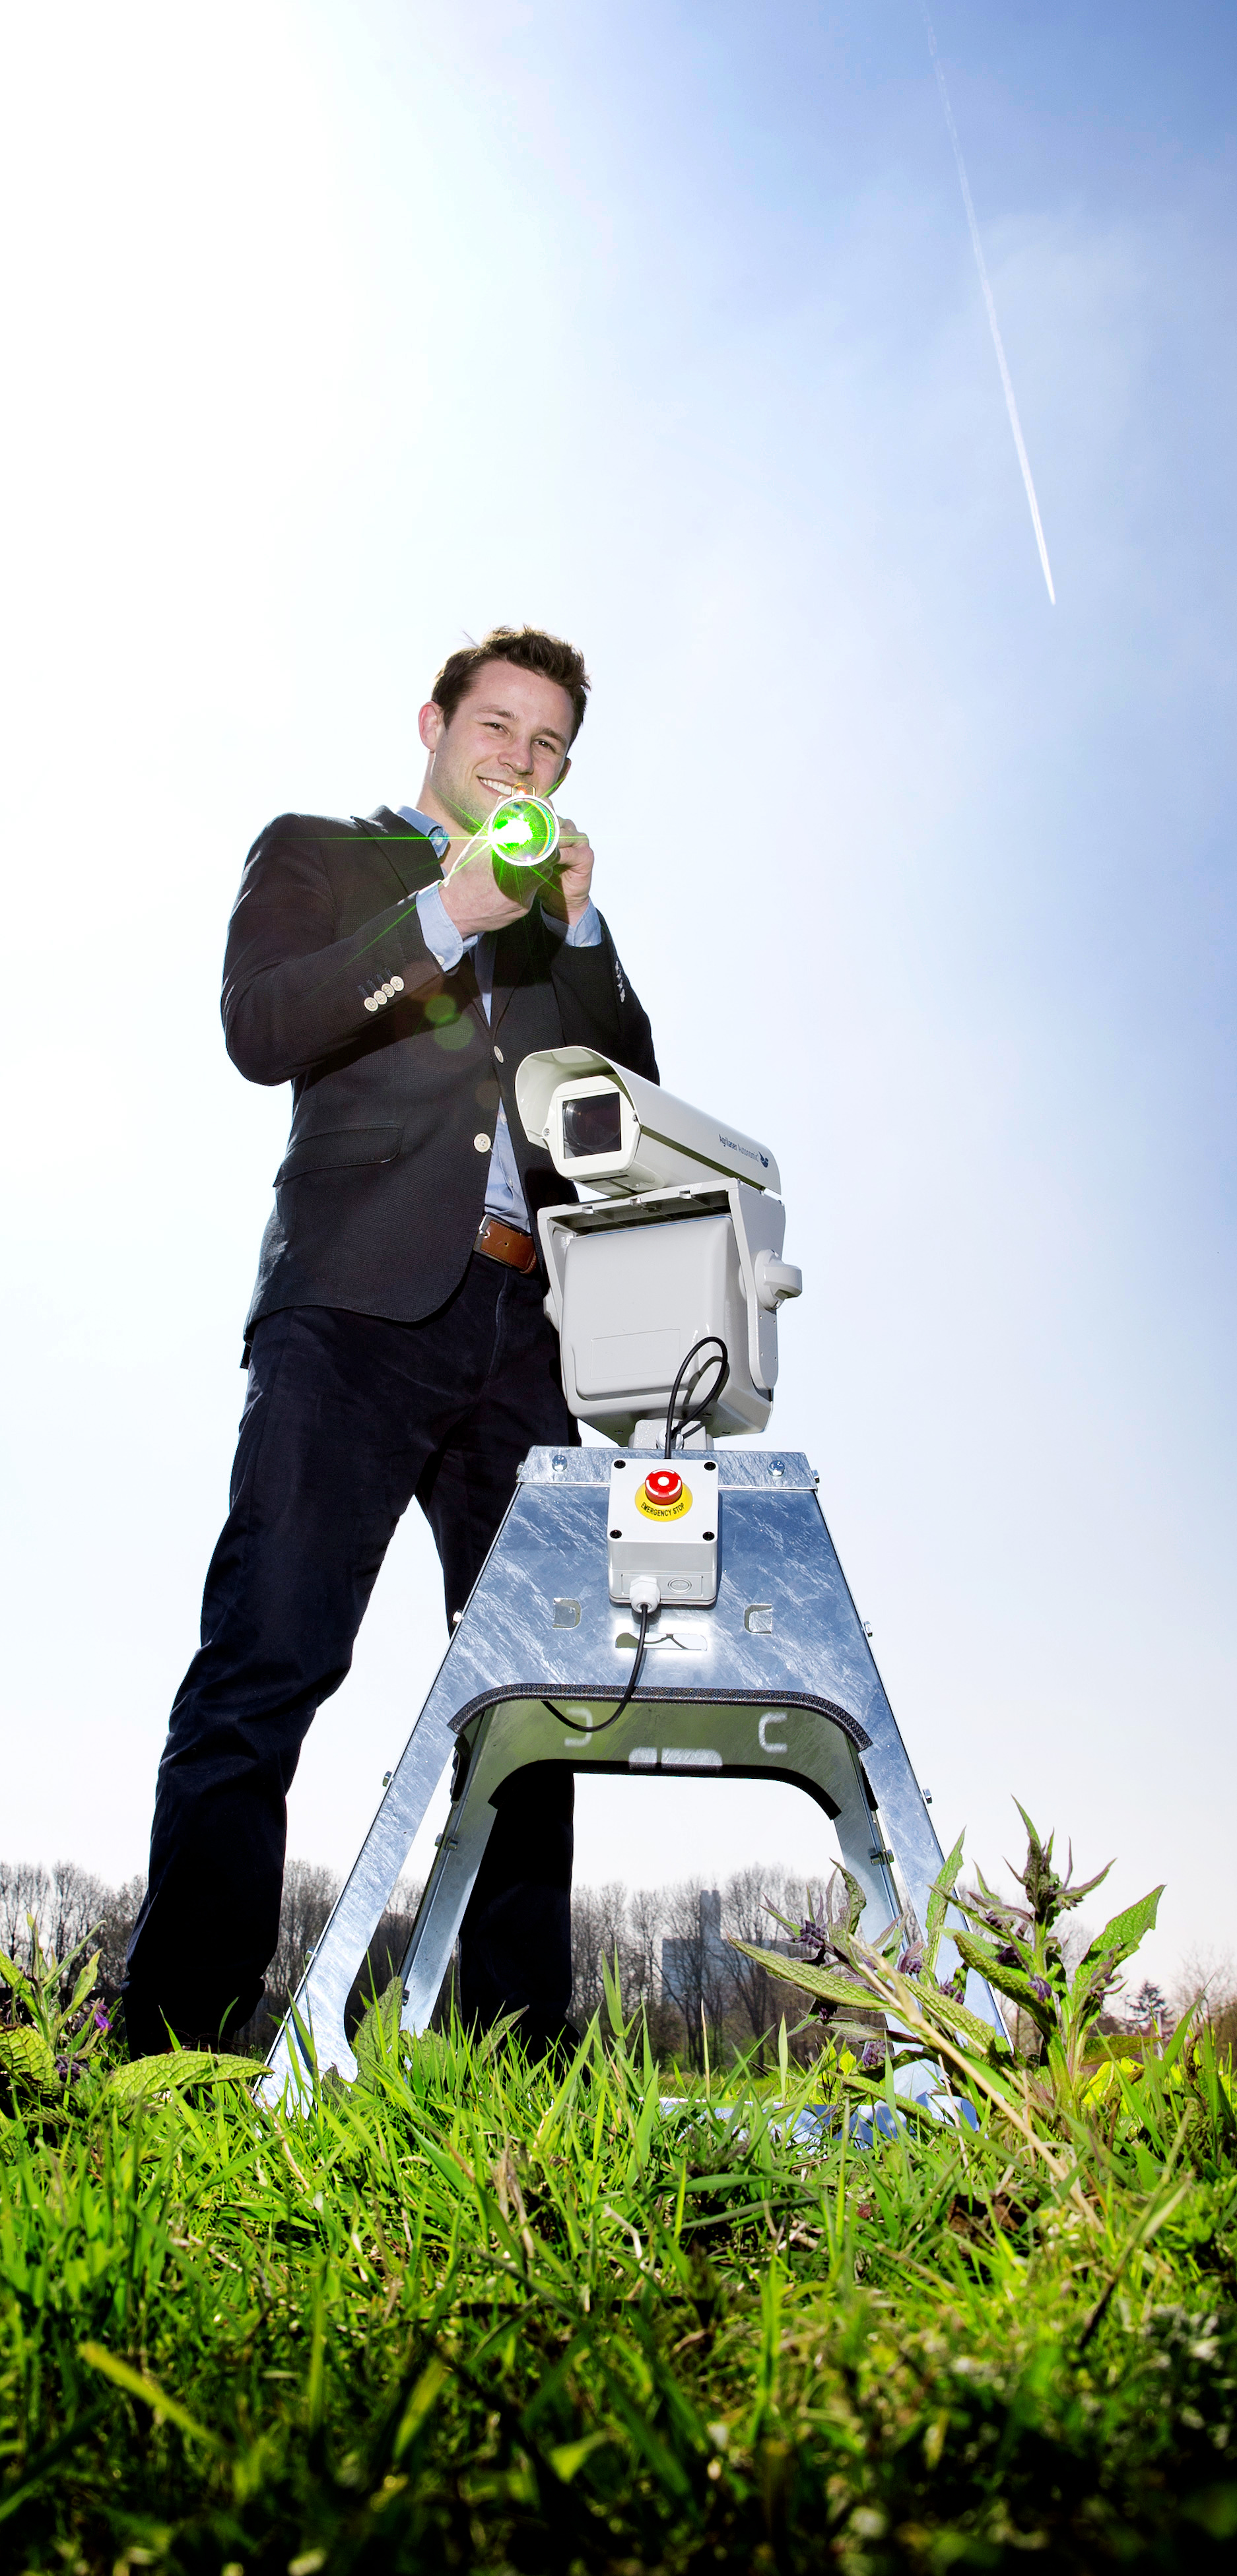 Steinar Henskes, oprichter van Bird Control Group